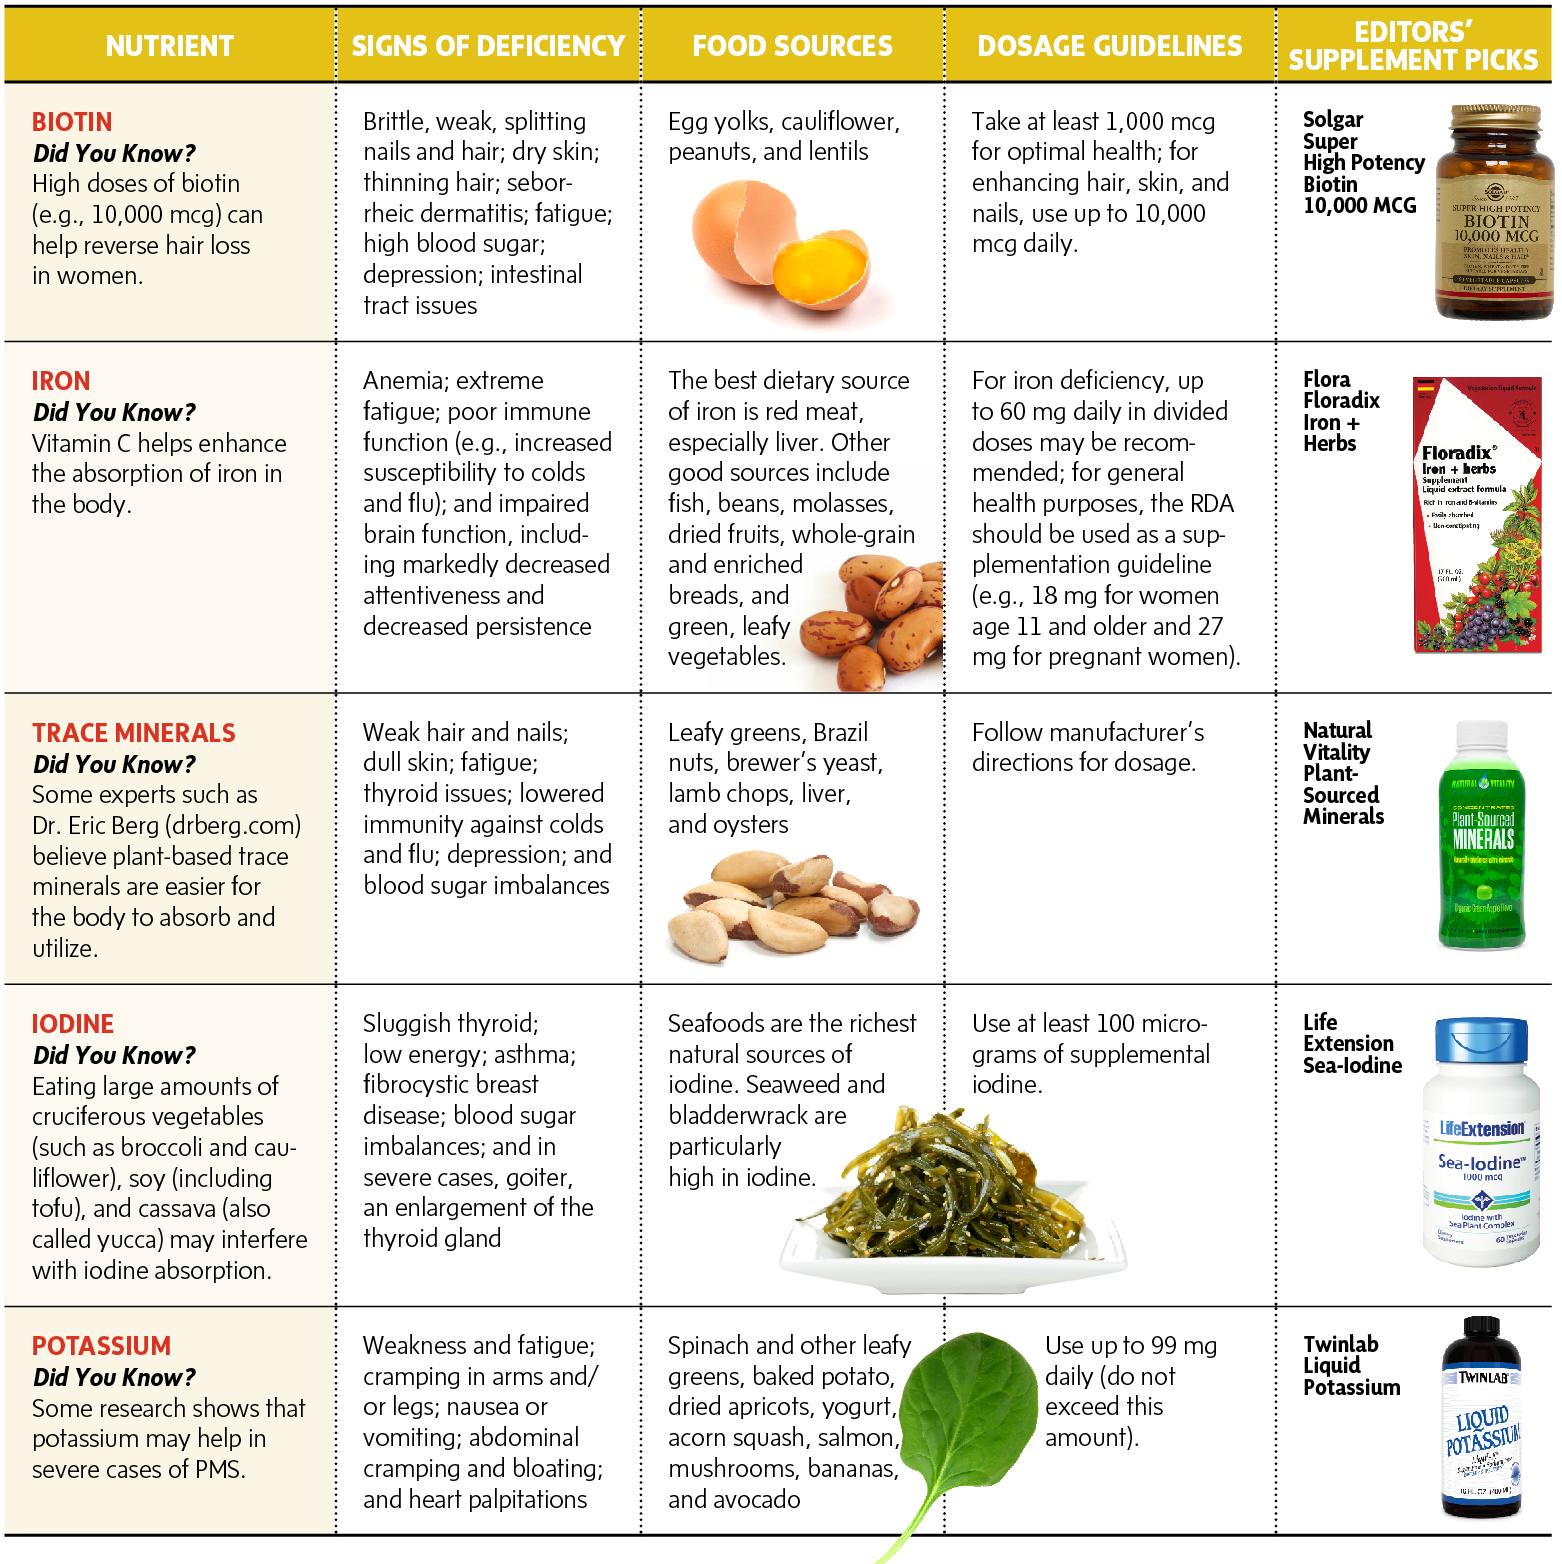 A Woman's Best Diet | Diet, Nutrition, Celiac disease diet